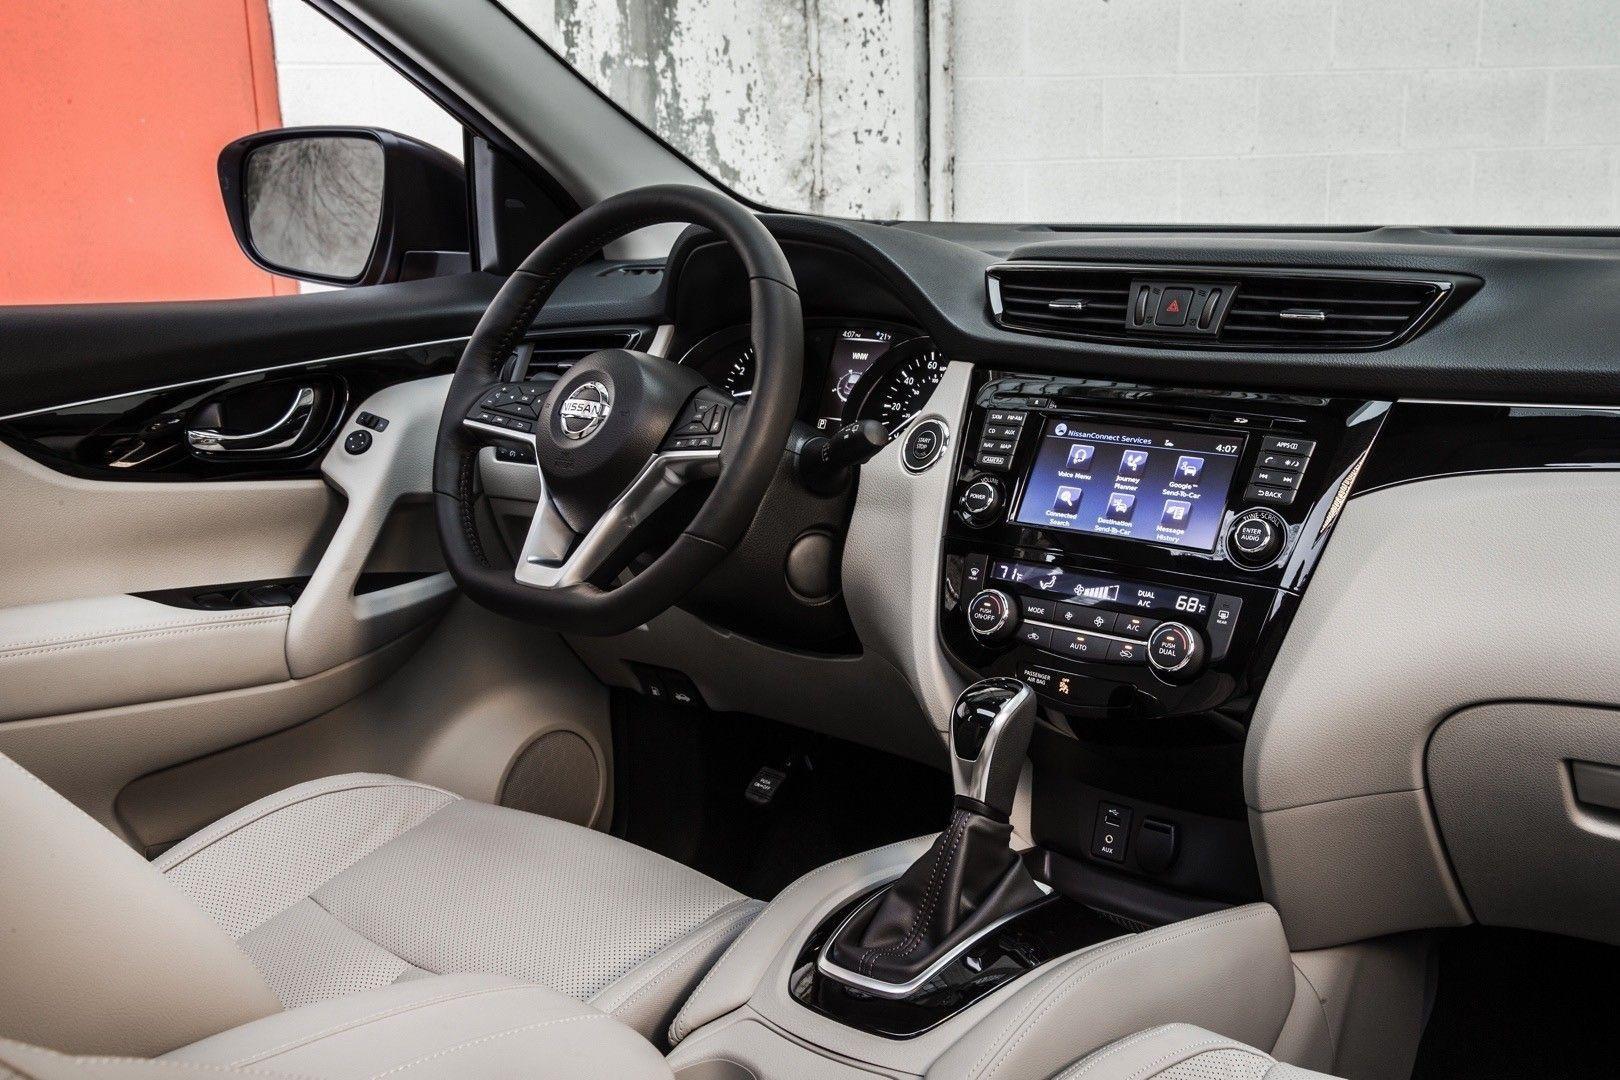 New Nissan Qashqai 2020 Exterior Automoviles, Vehiculos